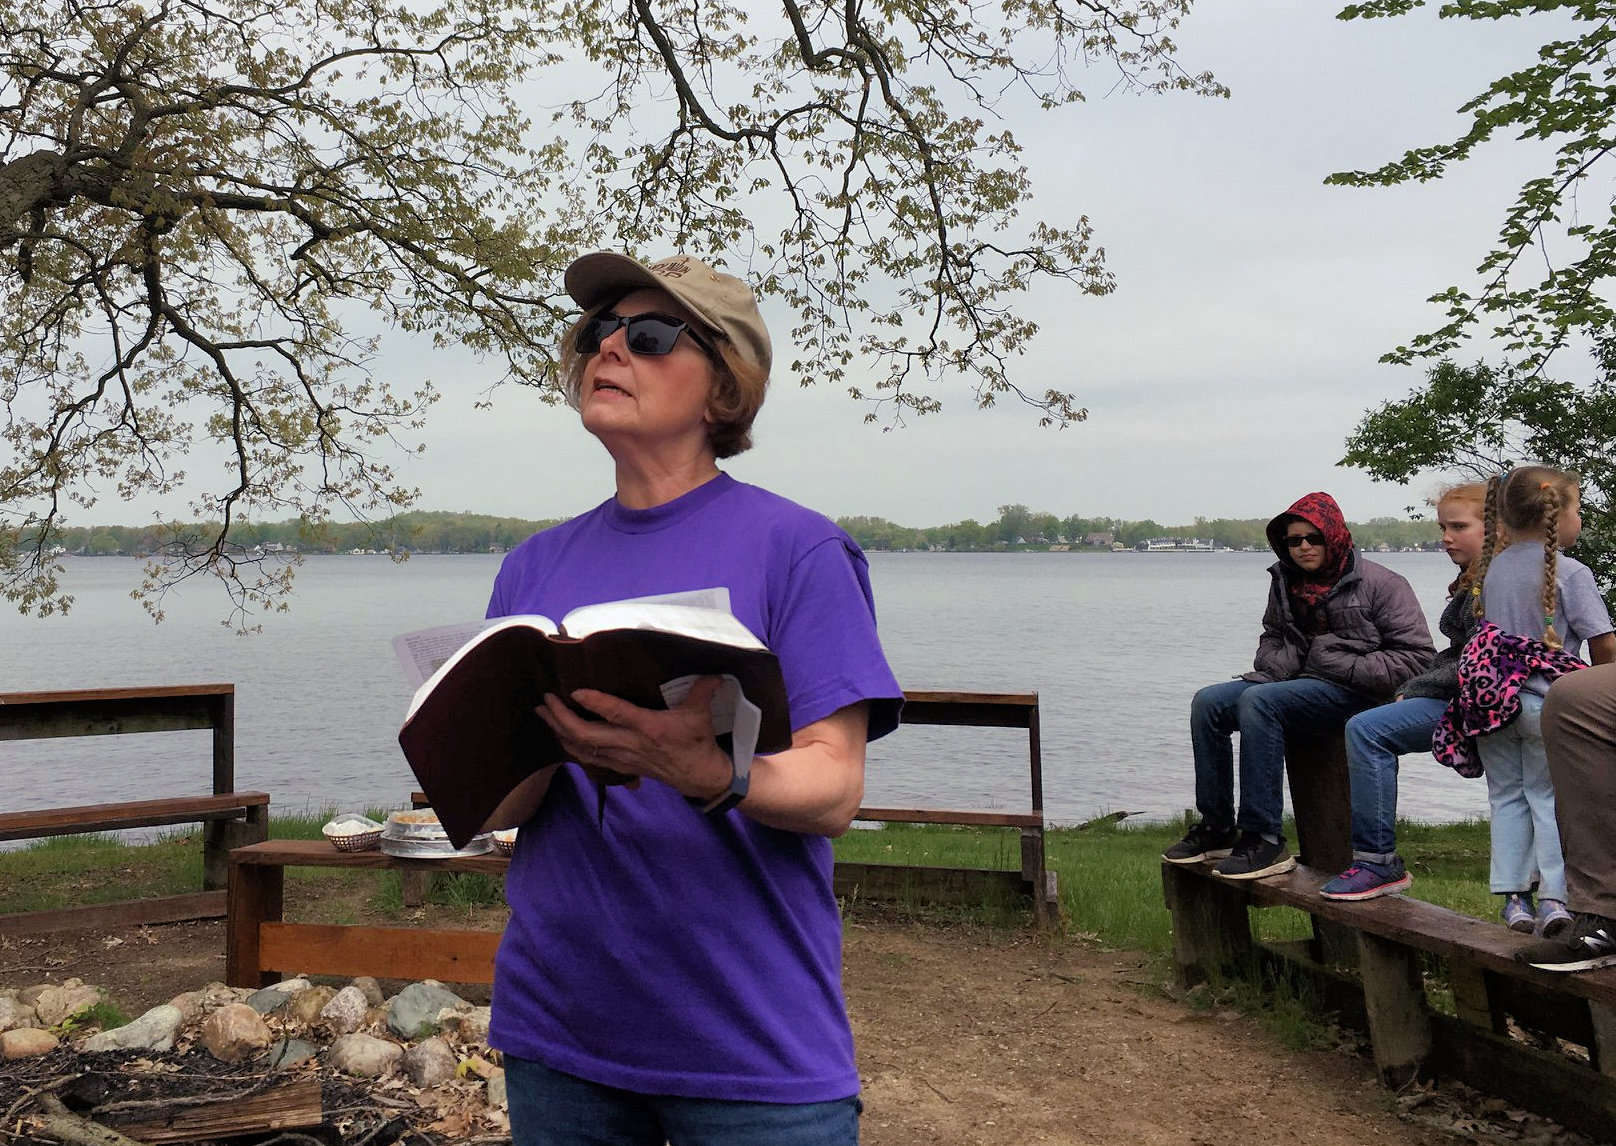 Woman talking outdoors